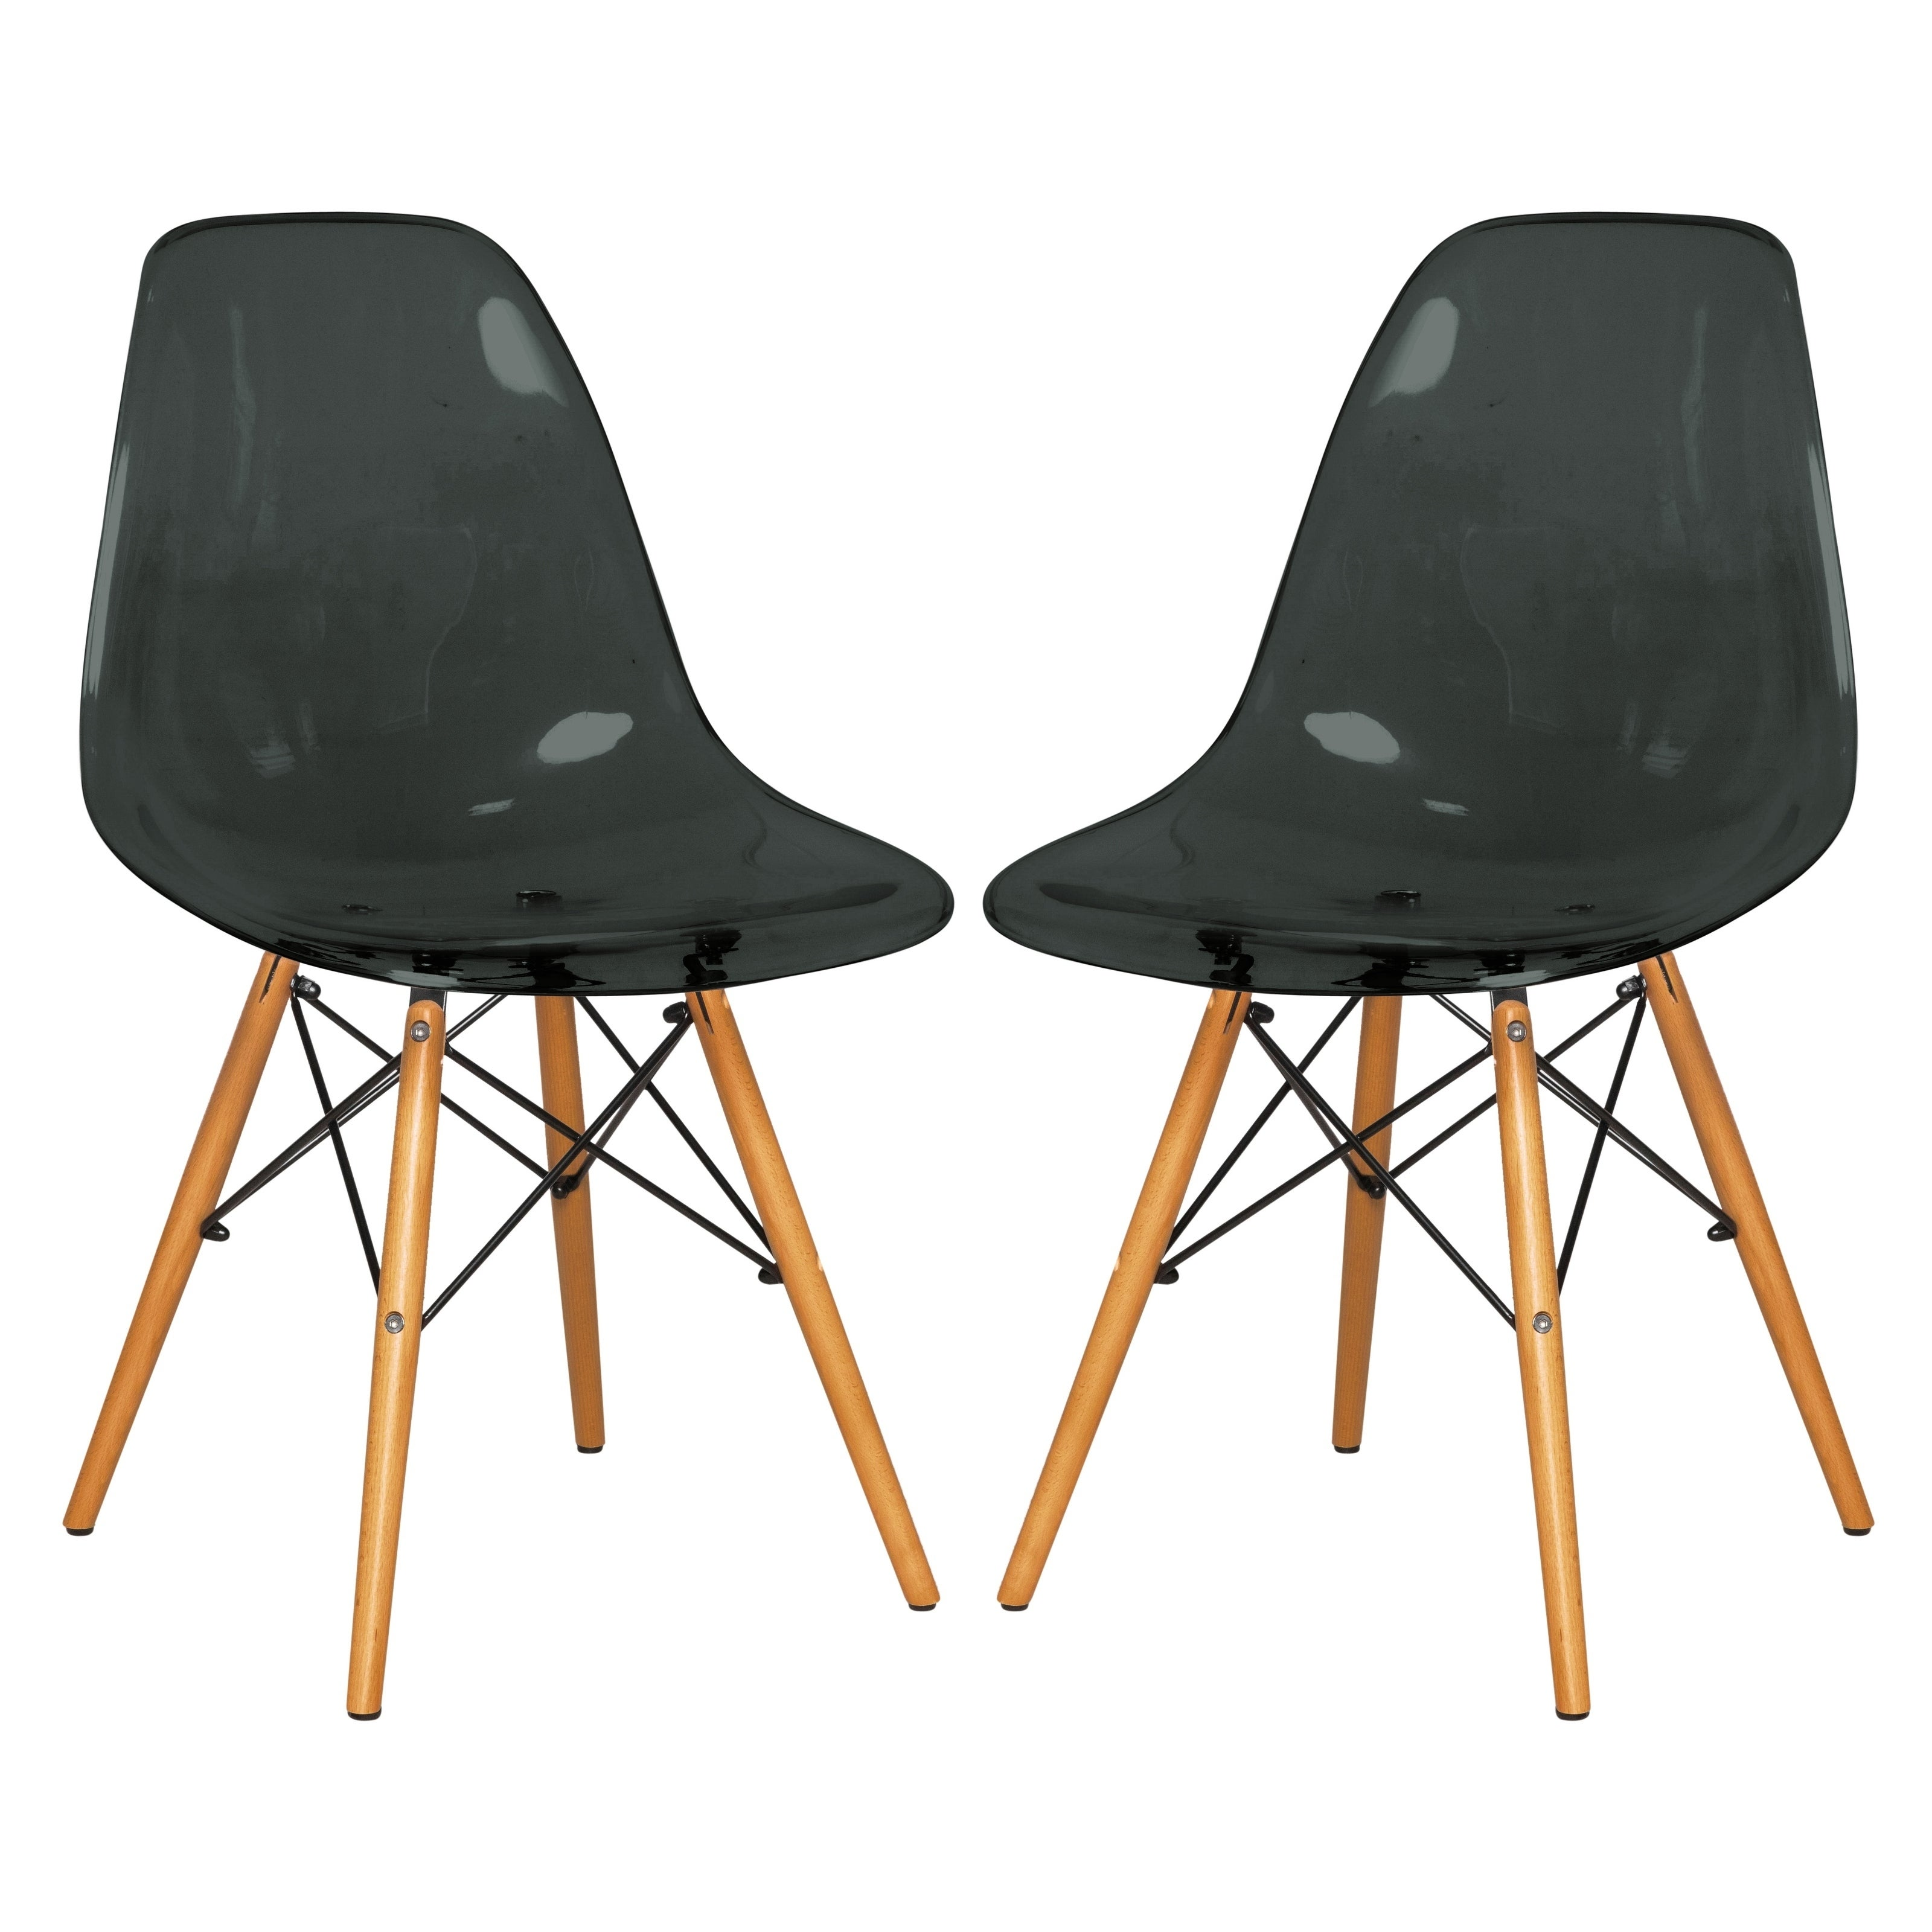 Pleasant Leisuremod Dover Transparent Black Dining Chair Eiffel Wood Legs 2 Set Dailytribune Chair Design For Home Dailytribuneorg